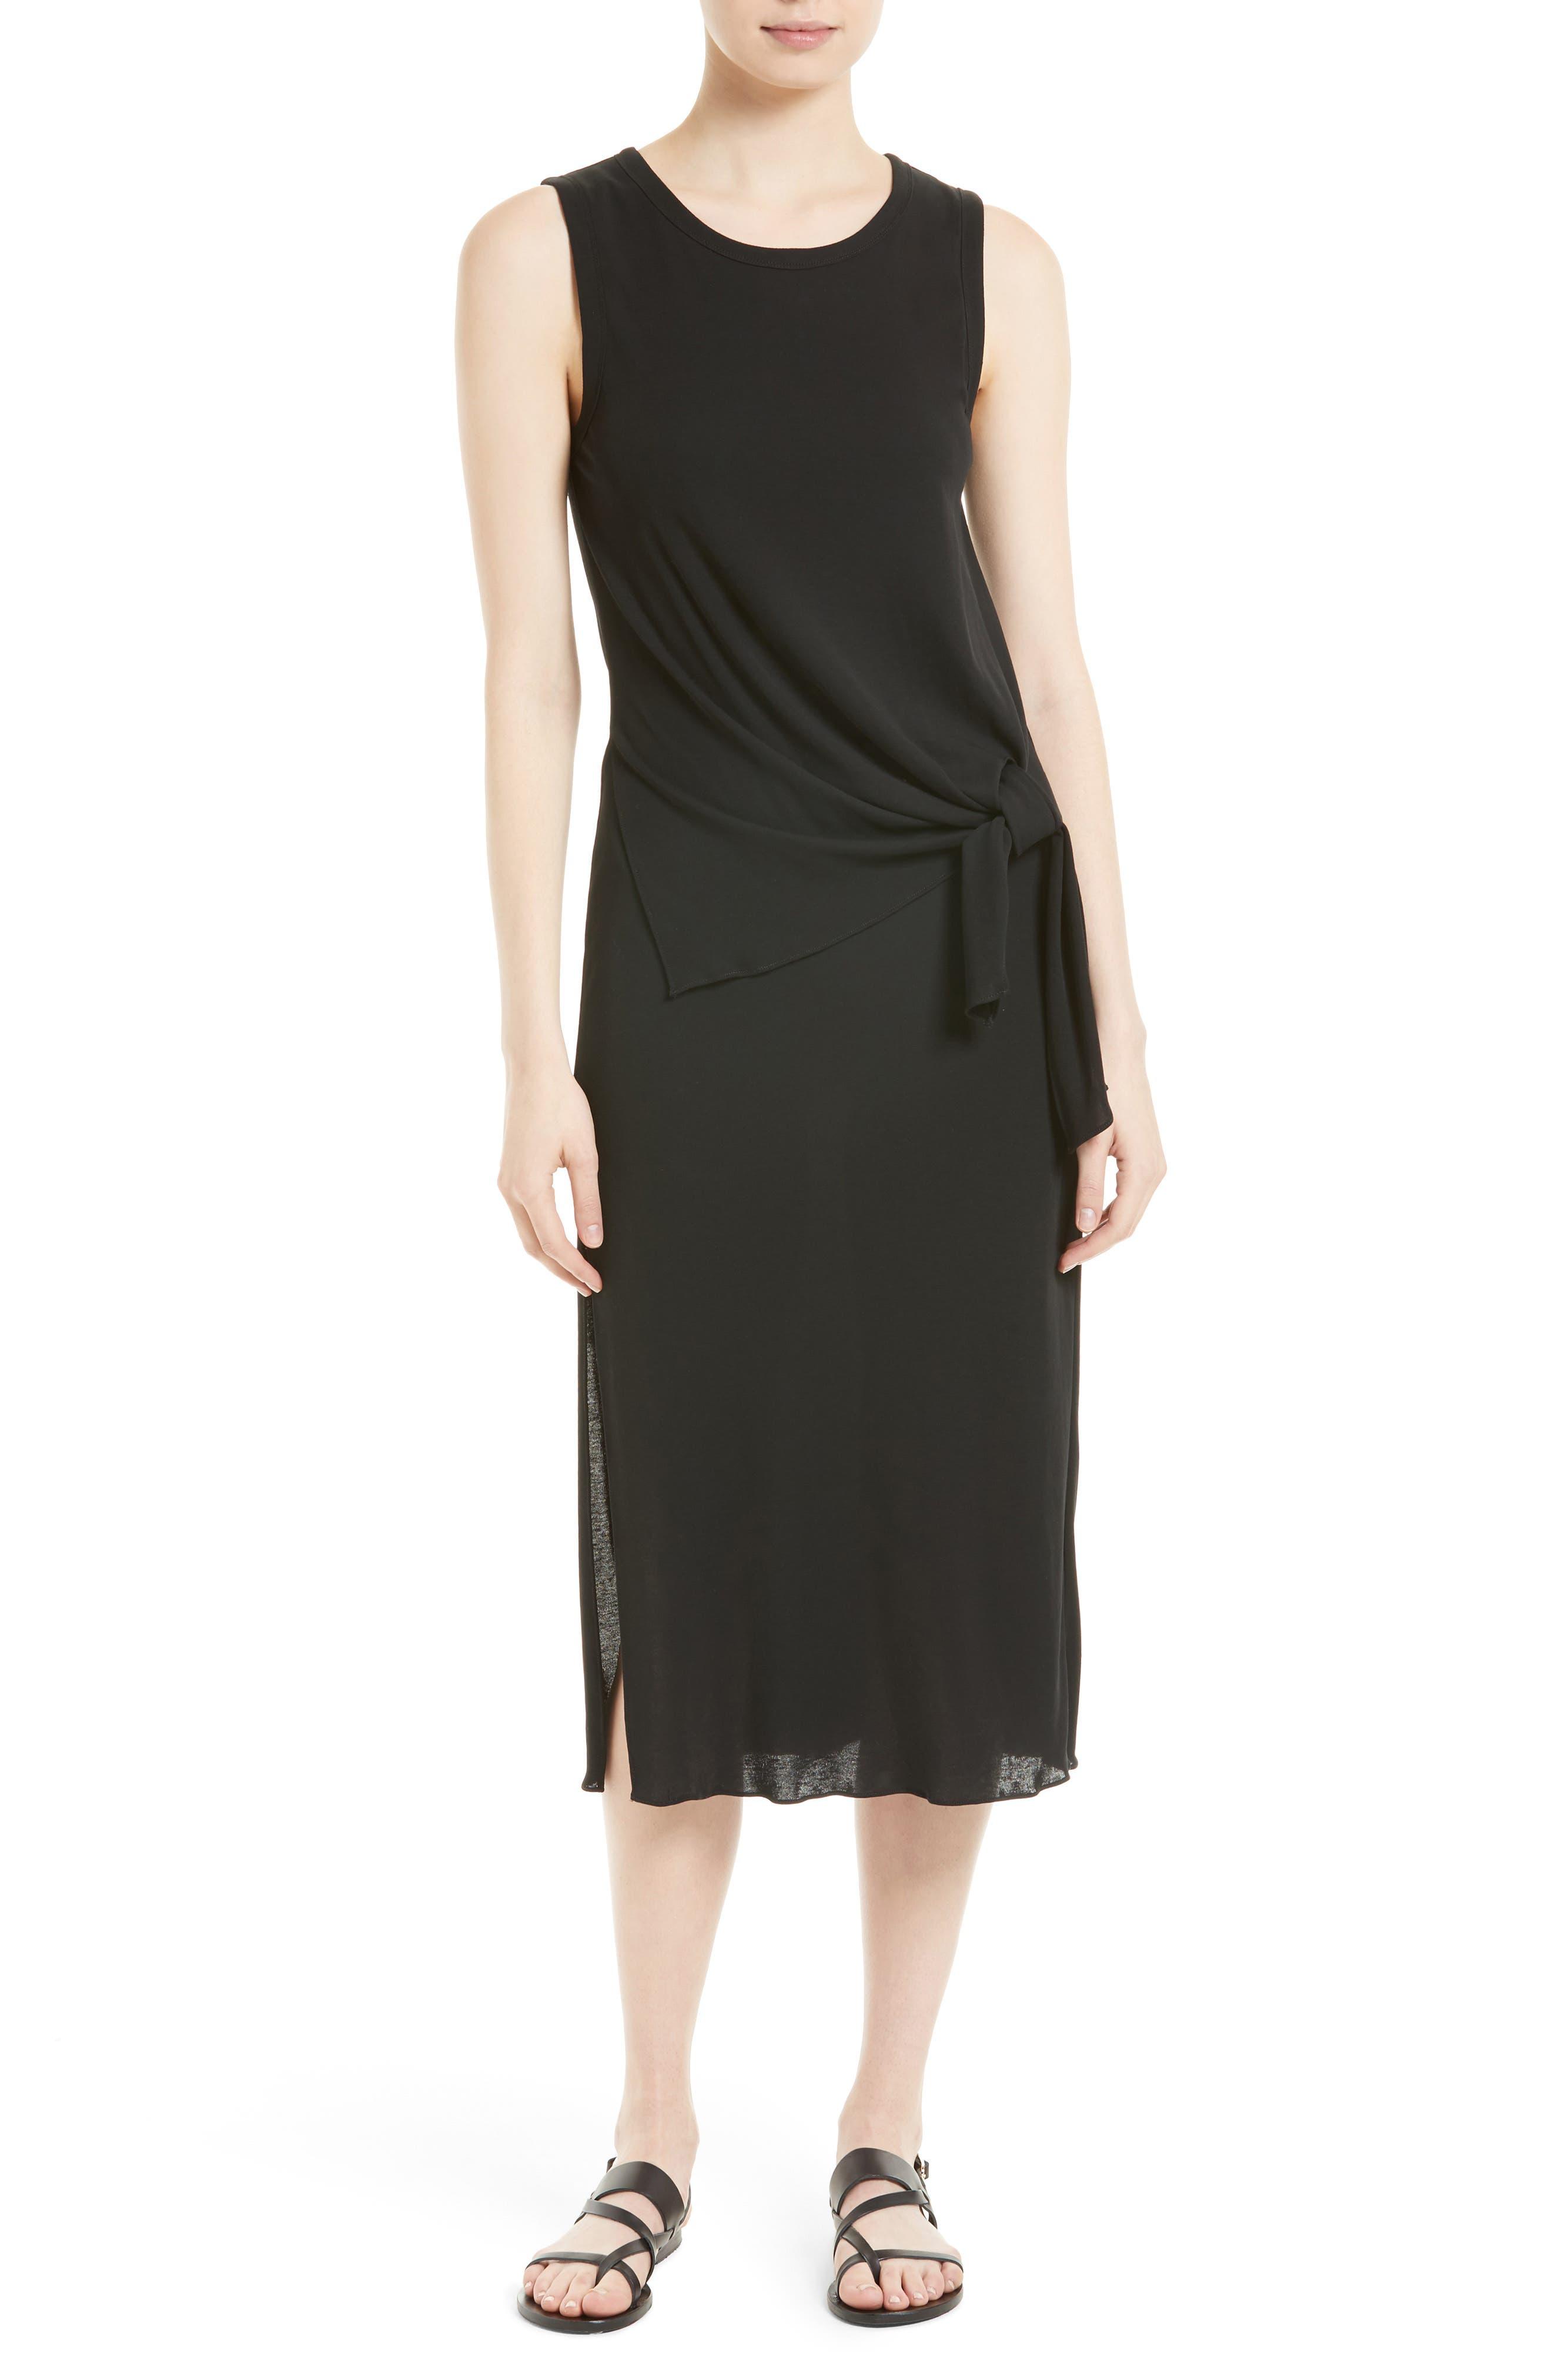 Dorotea K Tie Front Cotton Interlock Dress,                         Main,                         color, 001